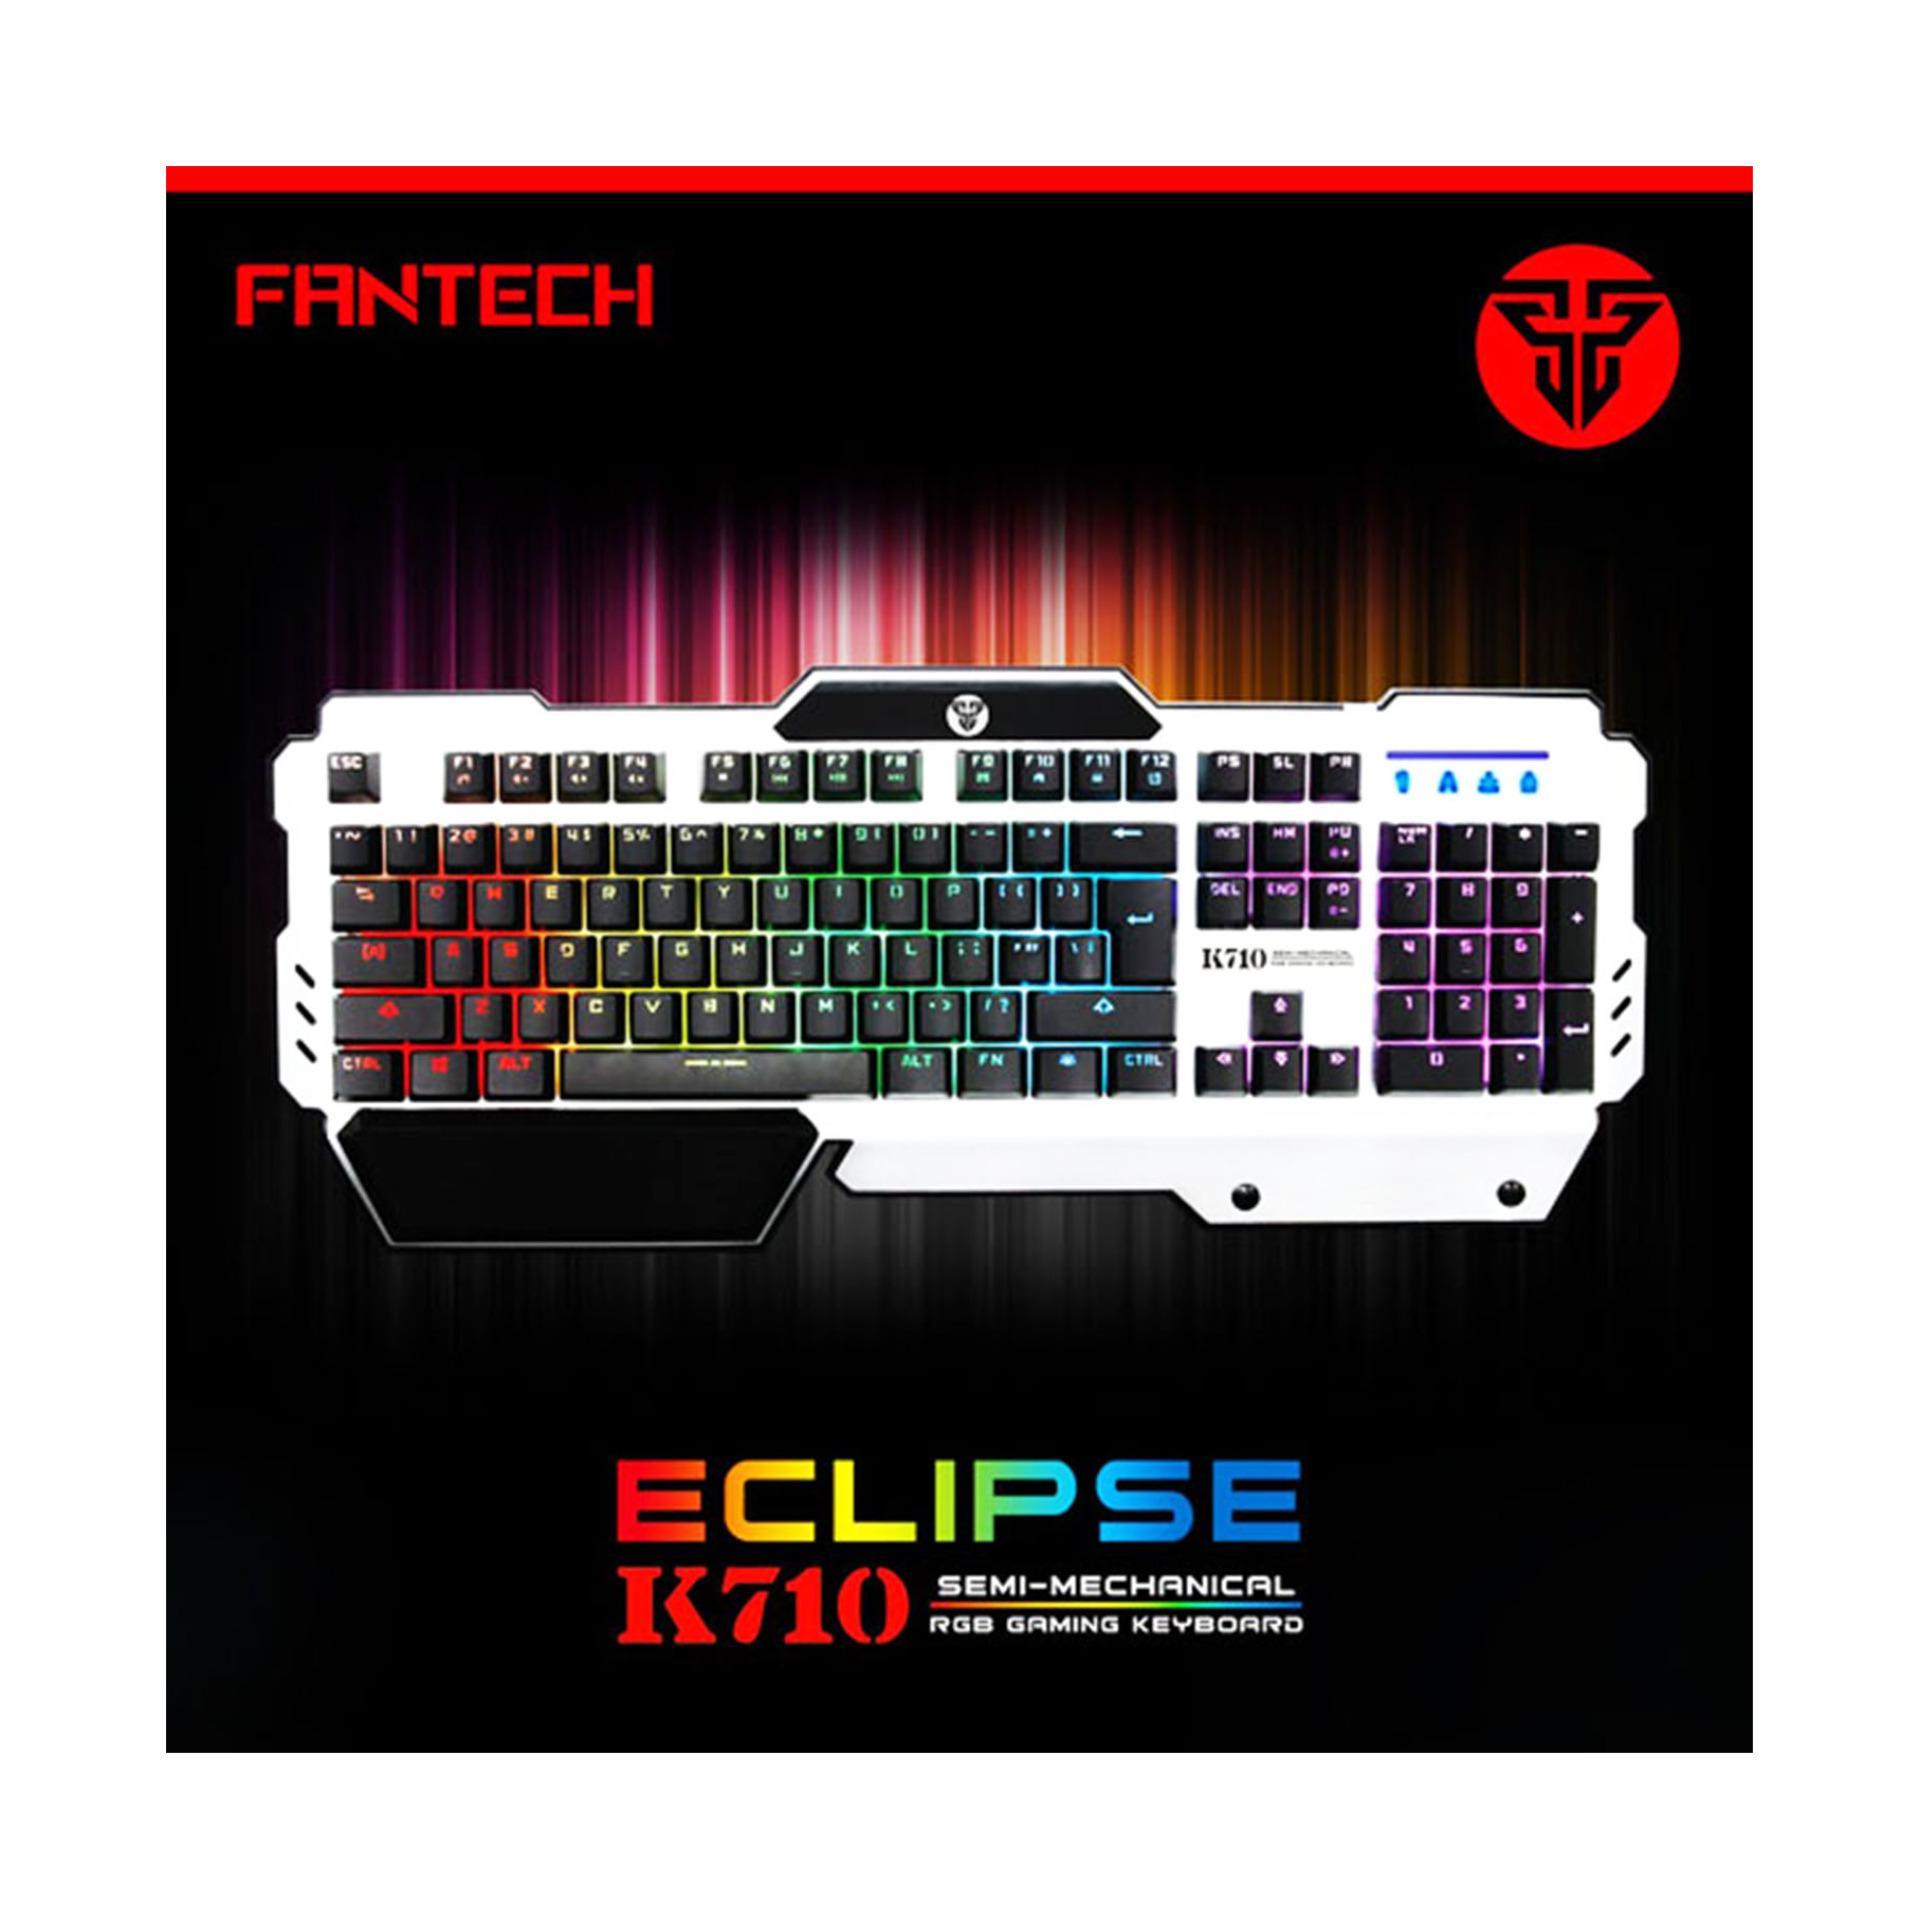 Fantech K710 Eclipse Keyboard - Keyboard Gaming